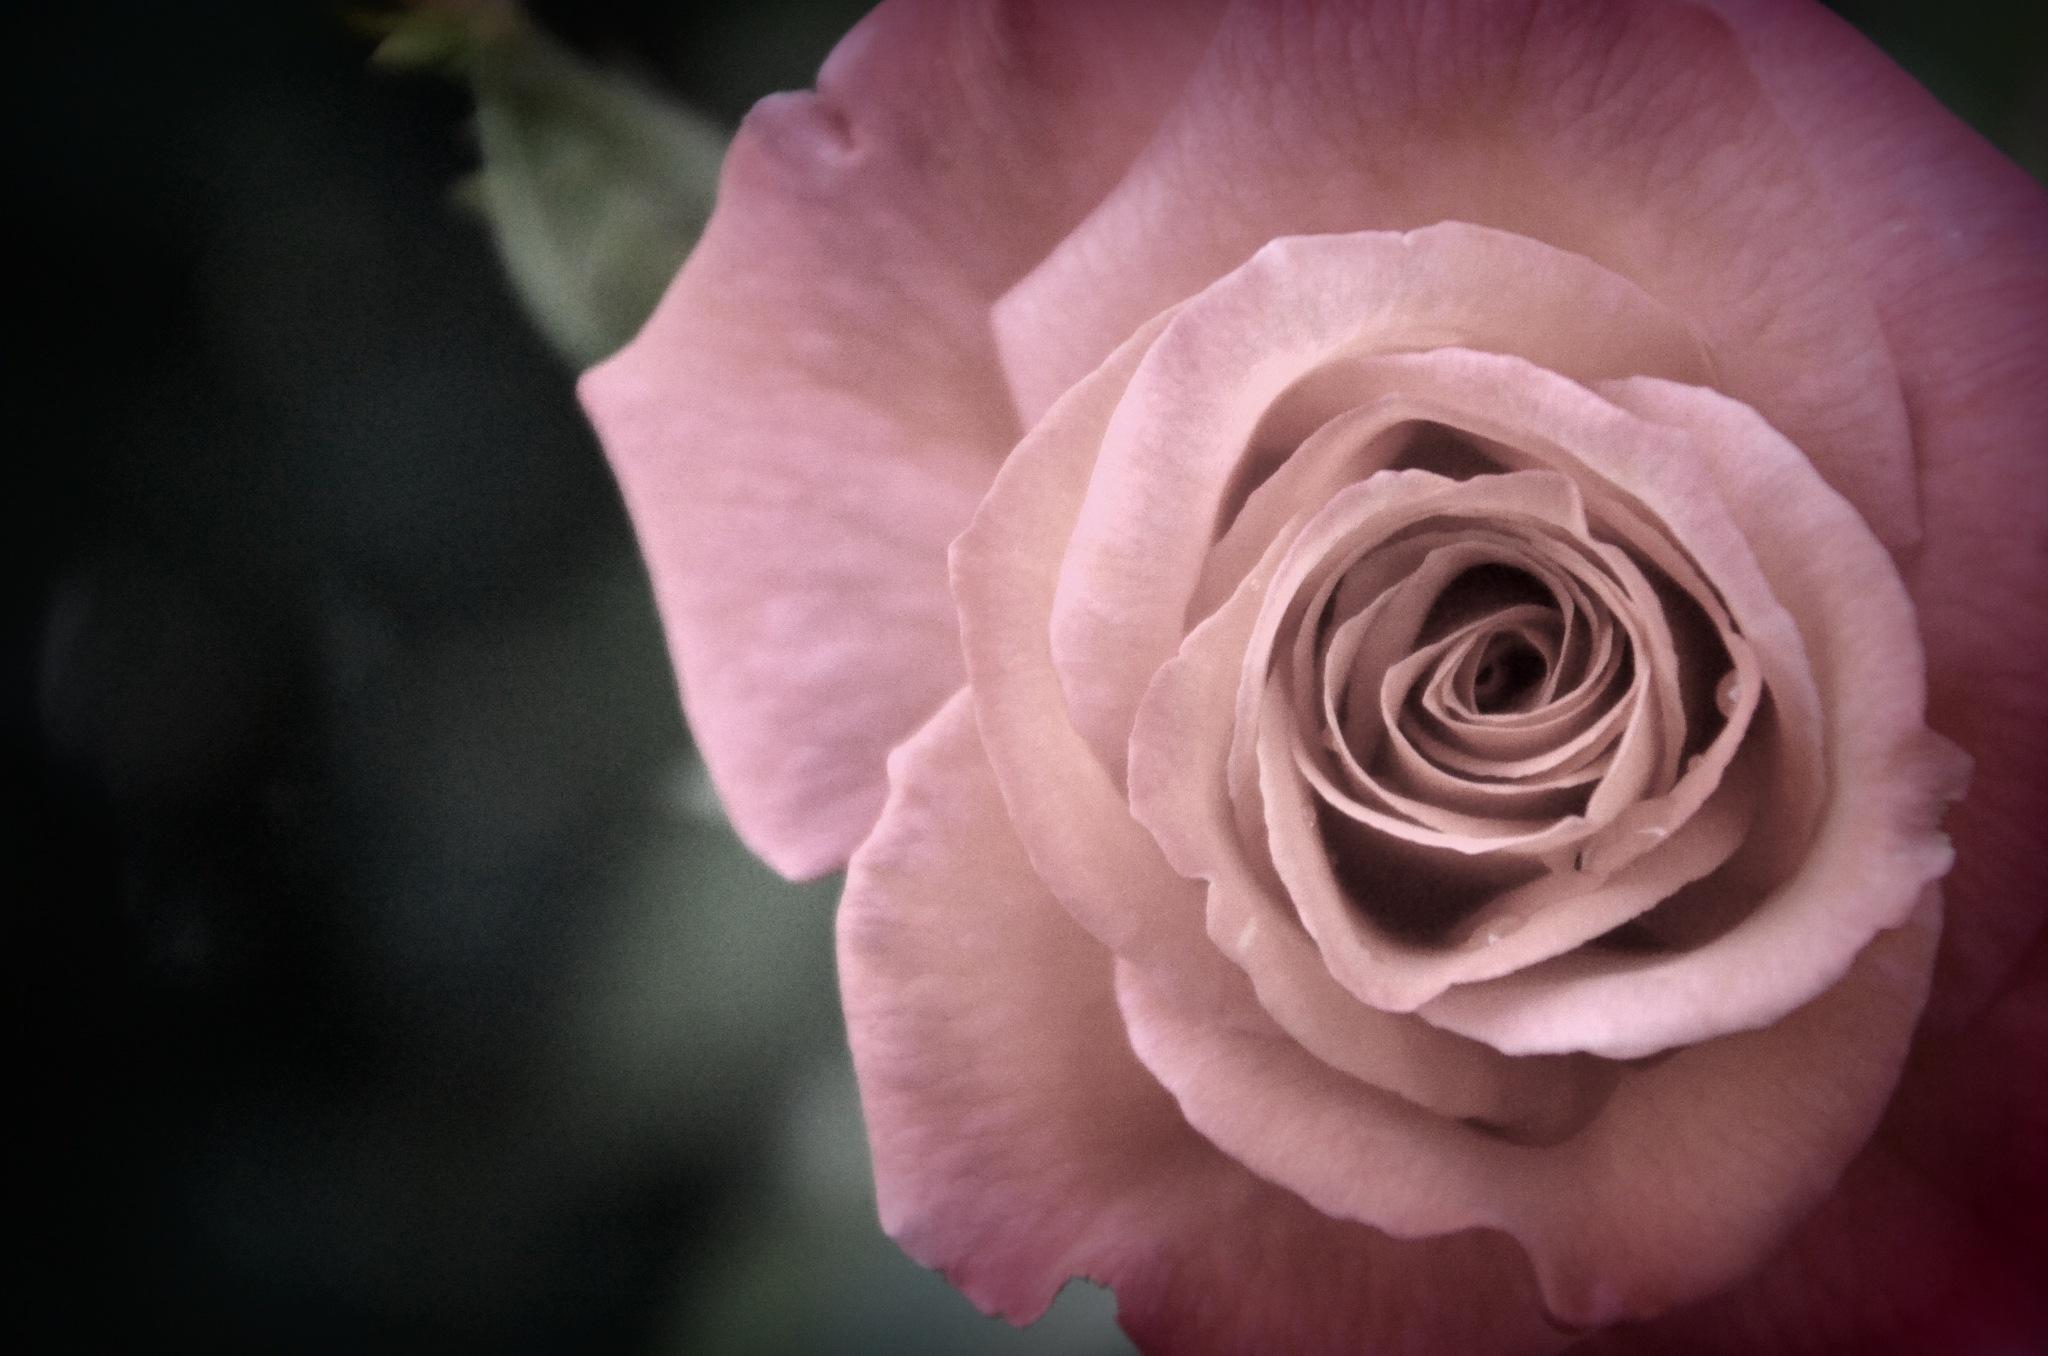 The Rose by chrisbitschnau